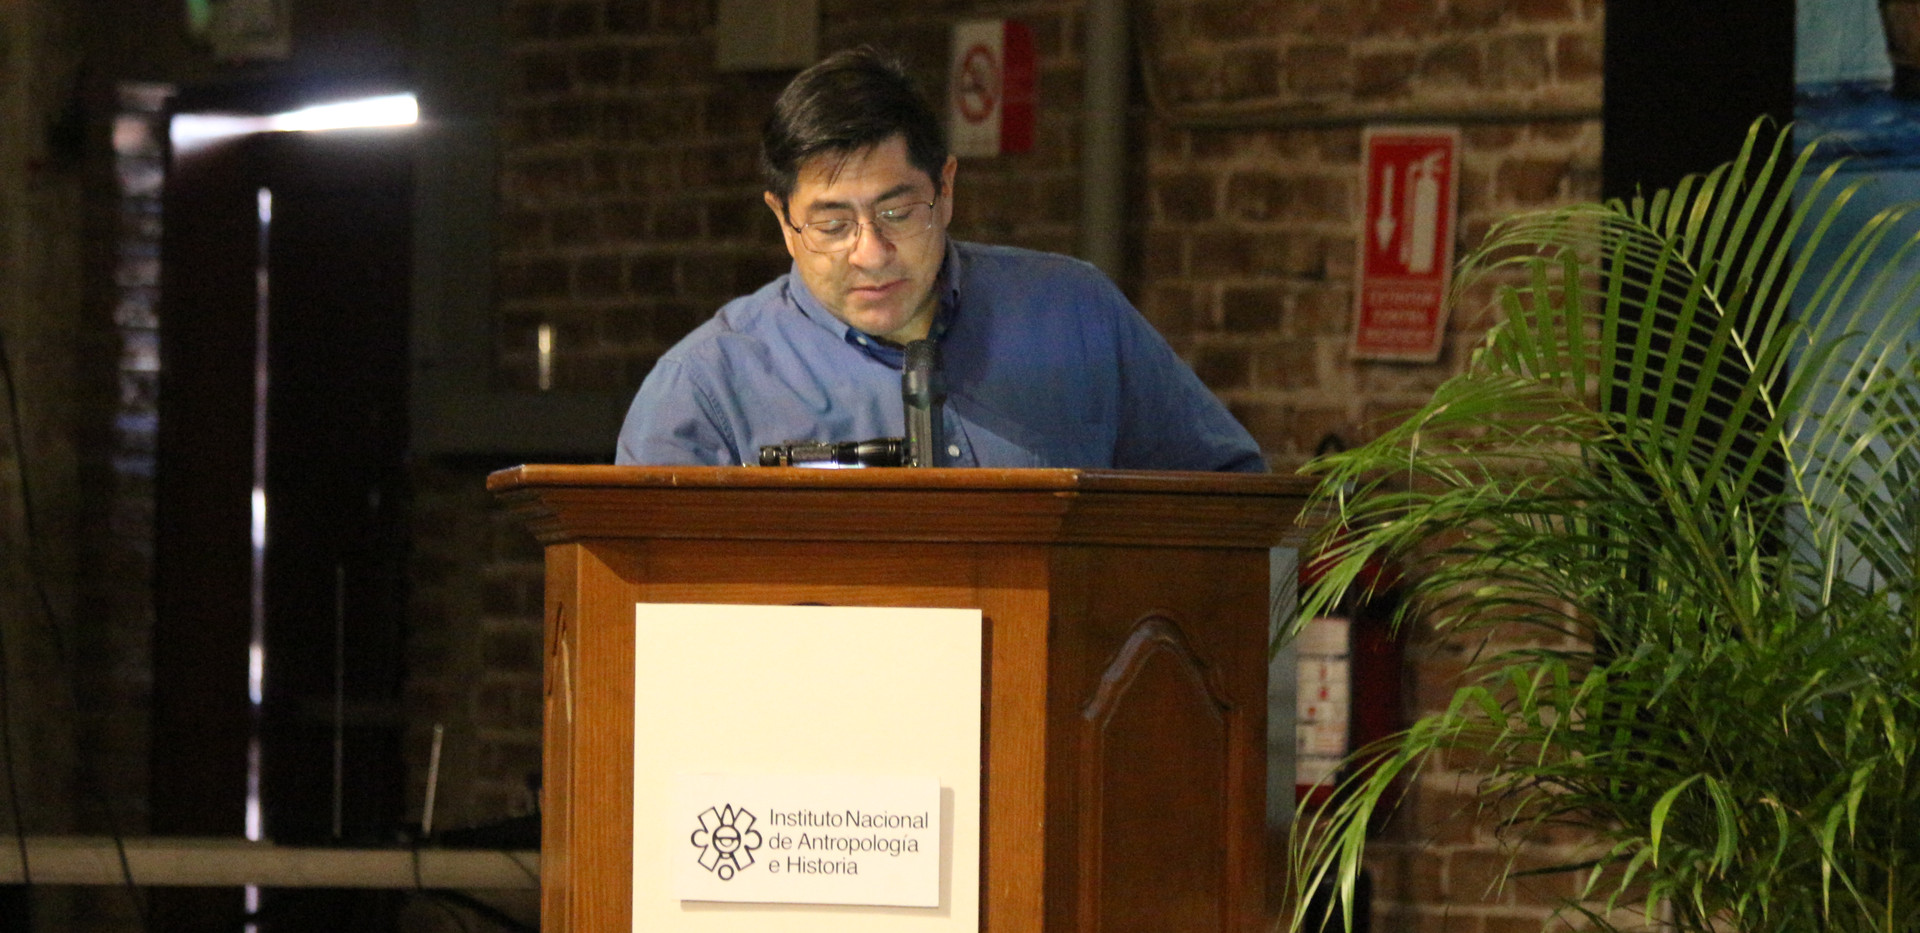 Arqlgo. Manuel Perez Rivas